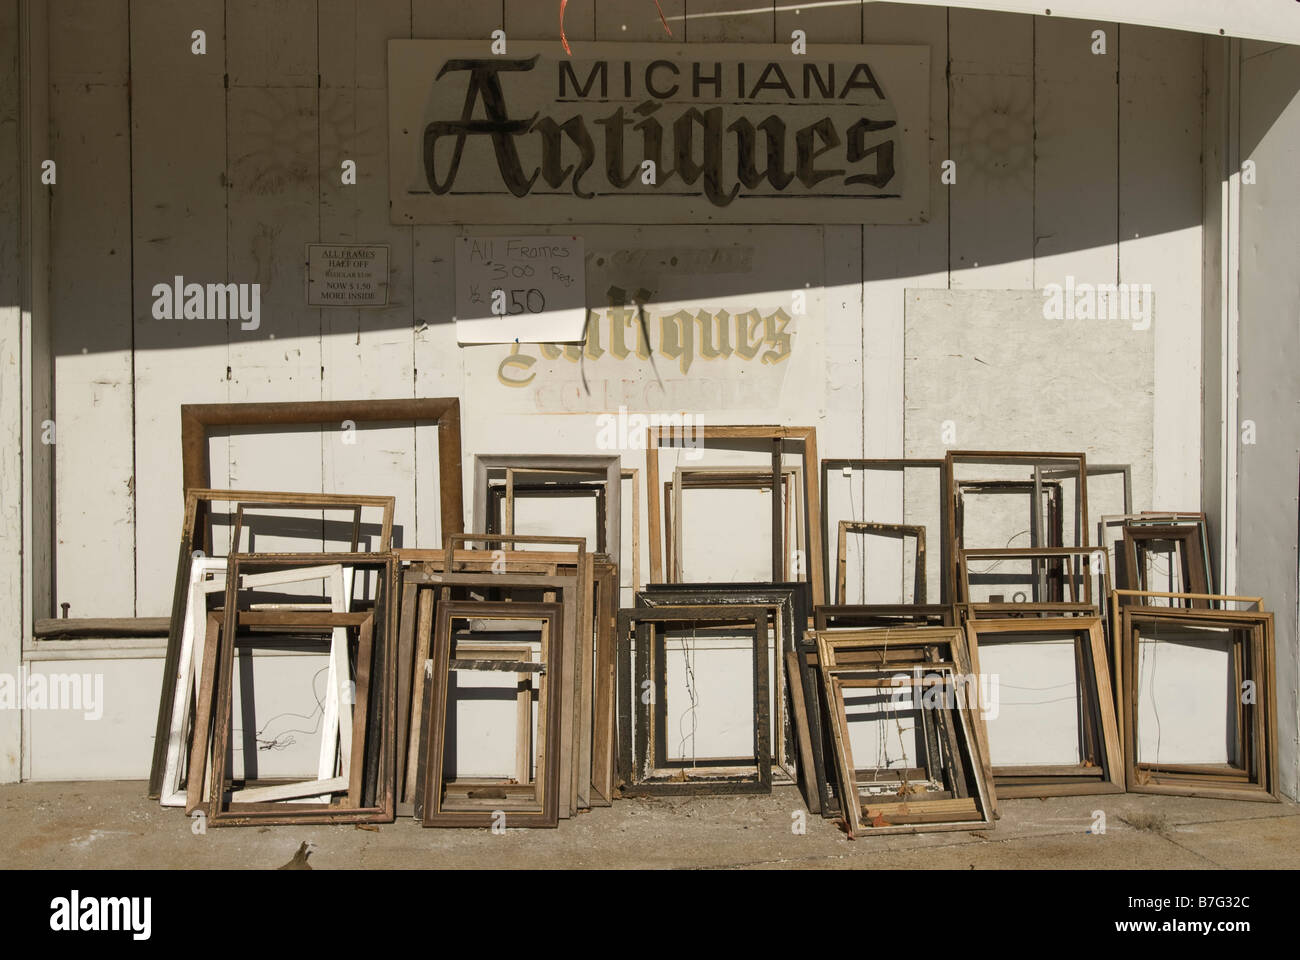 Alte Bilderrahmen zum Verkauf an Michiana Antiquitäten in Michigan ...